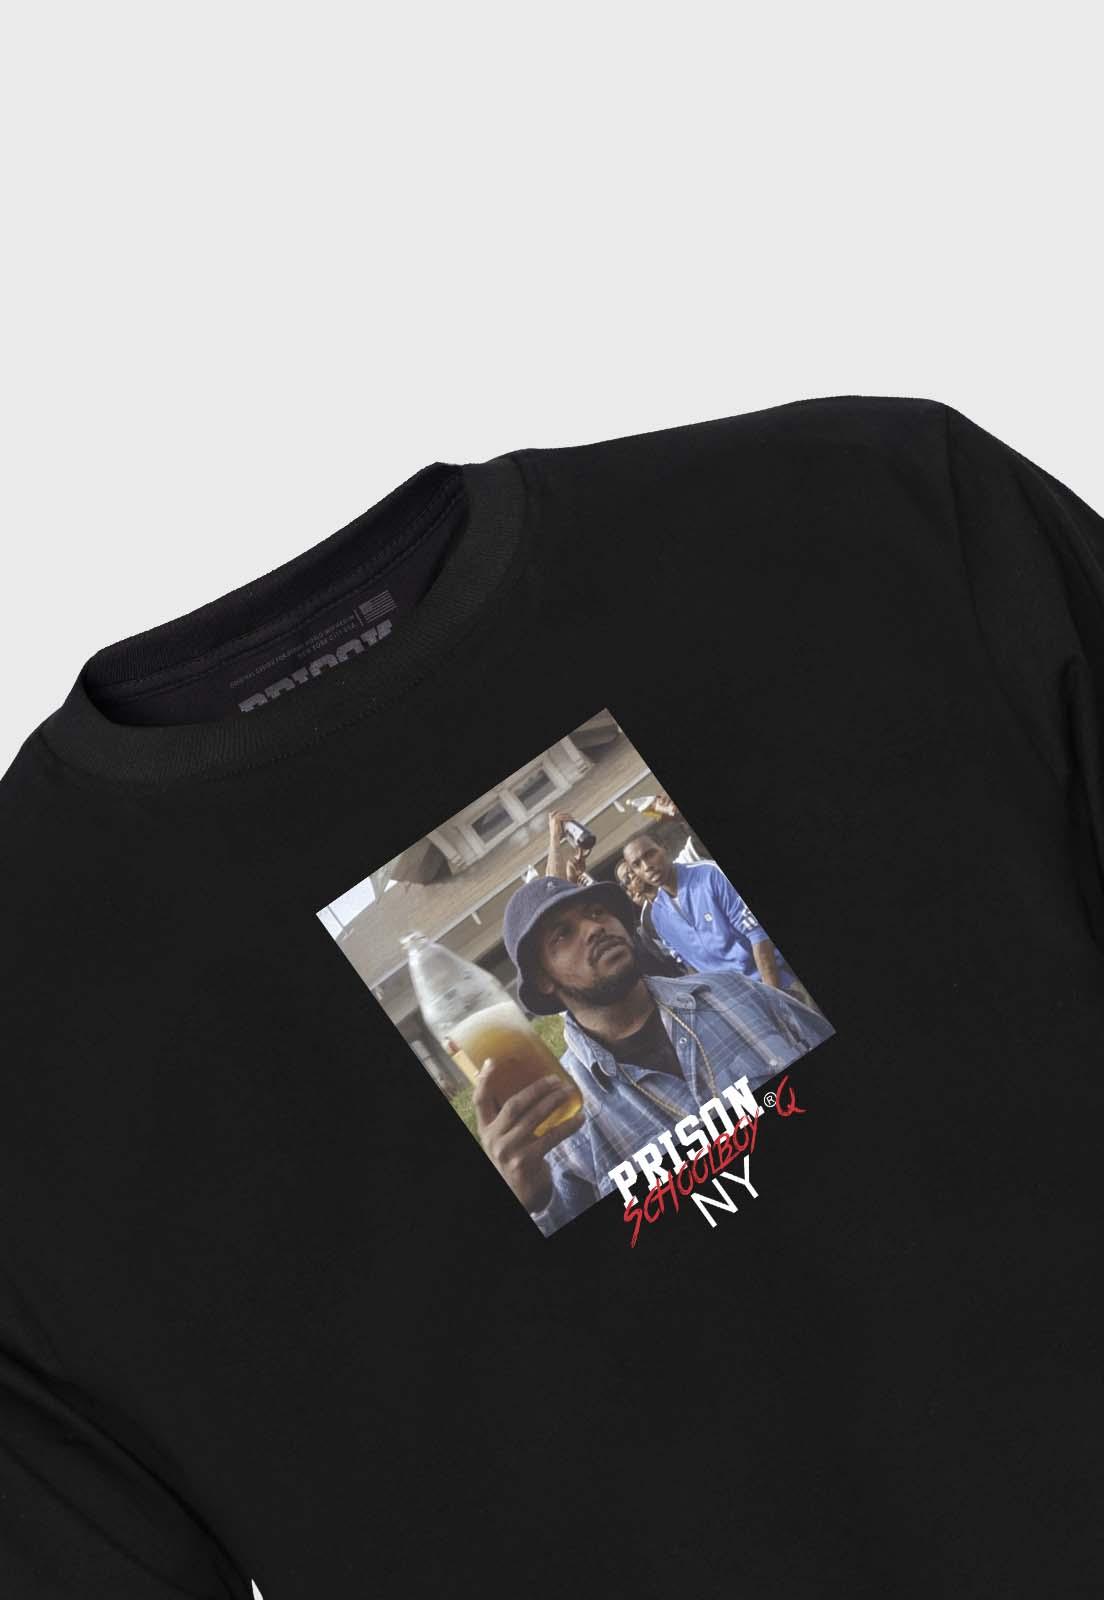 Camiseta Streetwear Prison Global Rappers Schoolboy Q